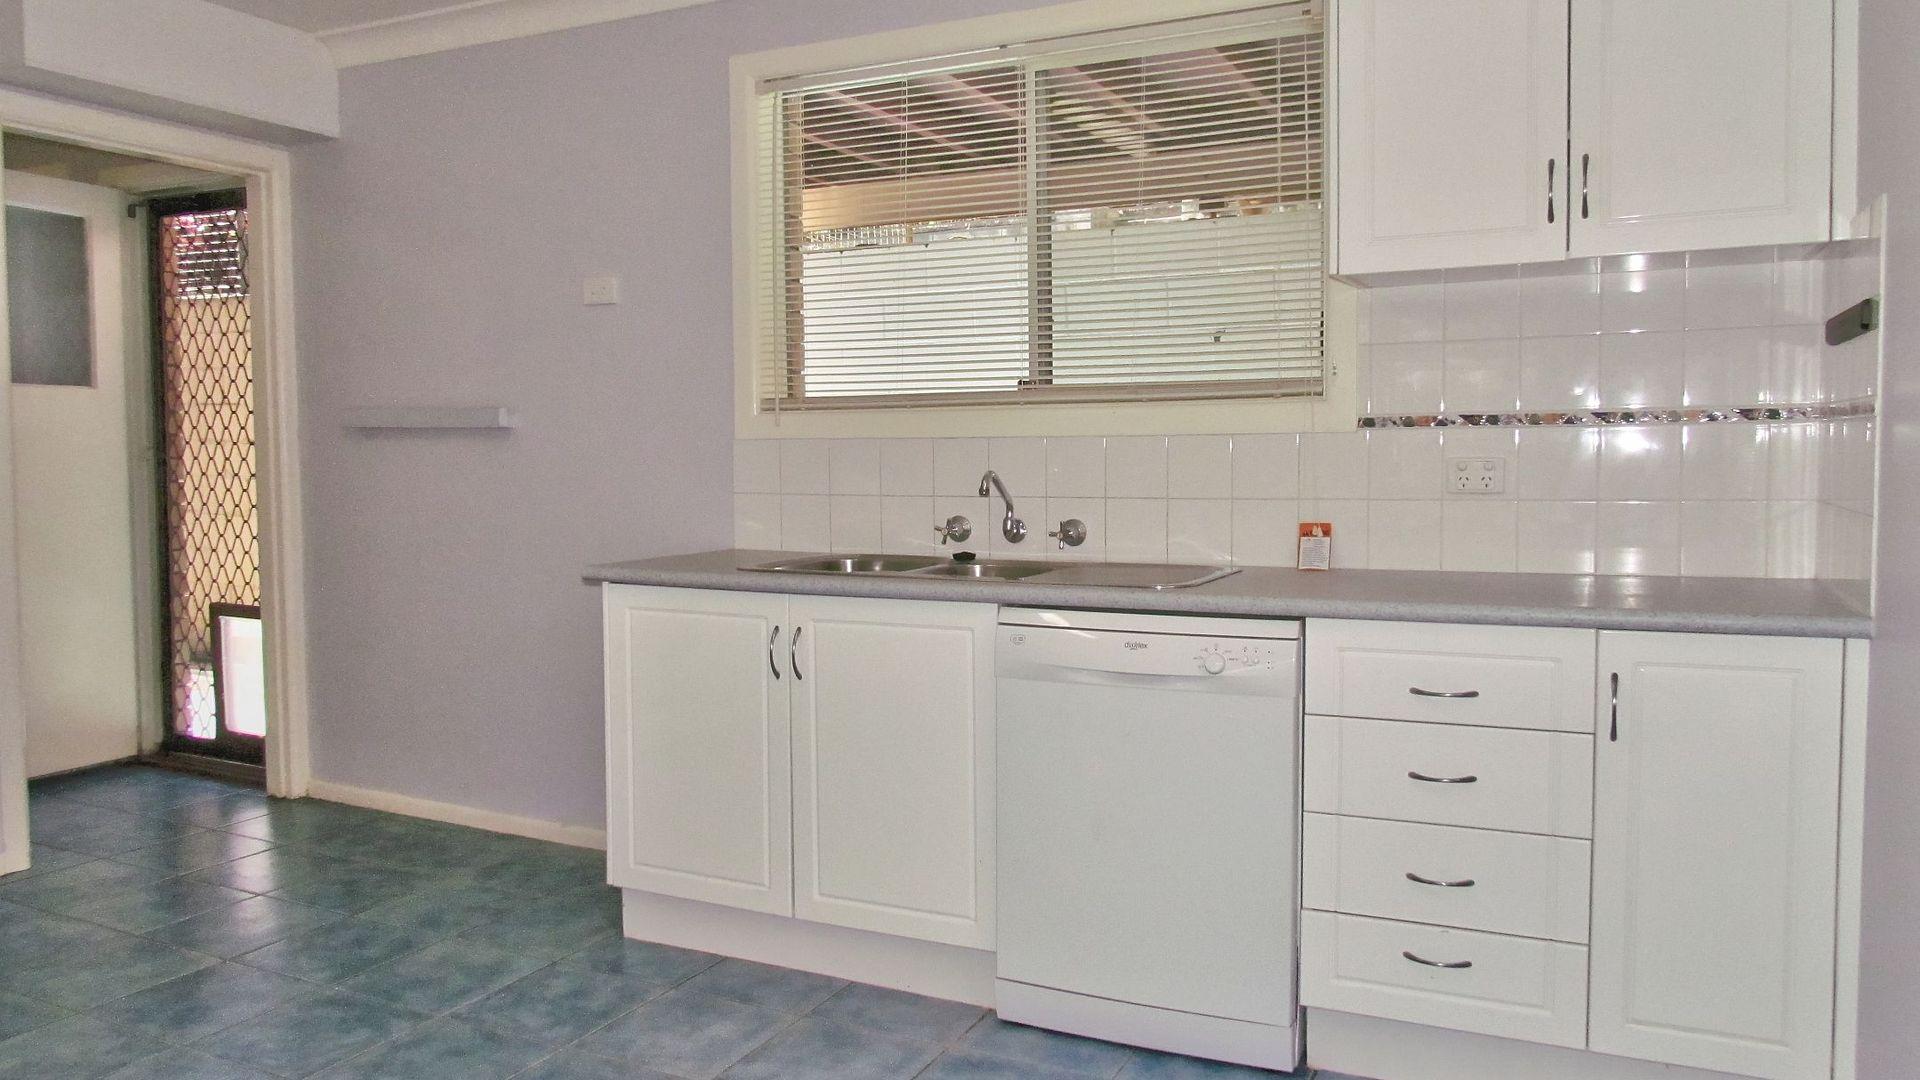 43 Cameron Street, MacLean NSW 2463, Image 2